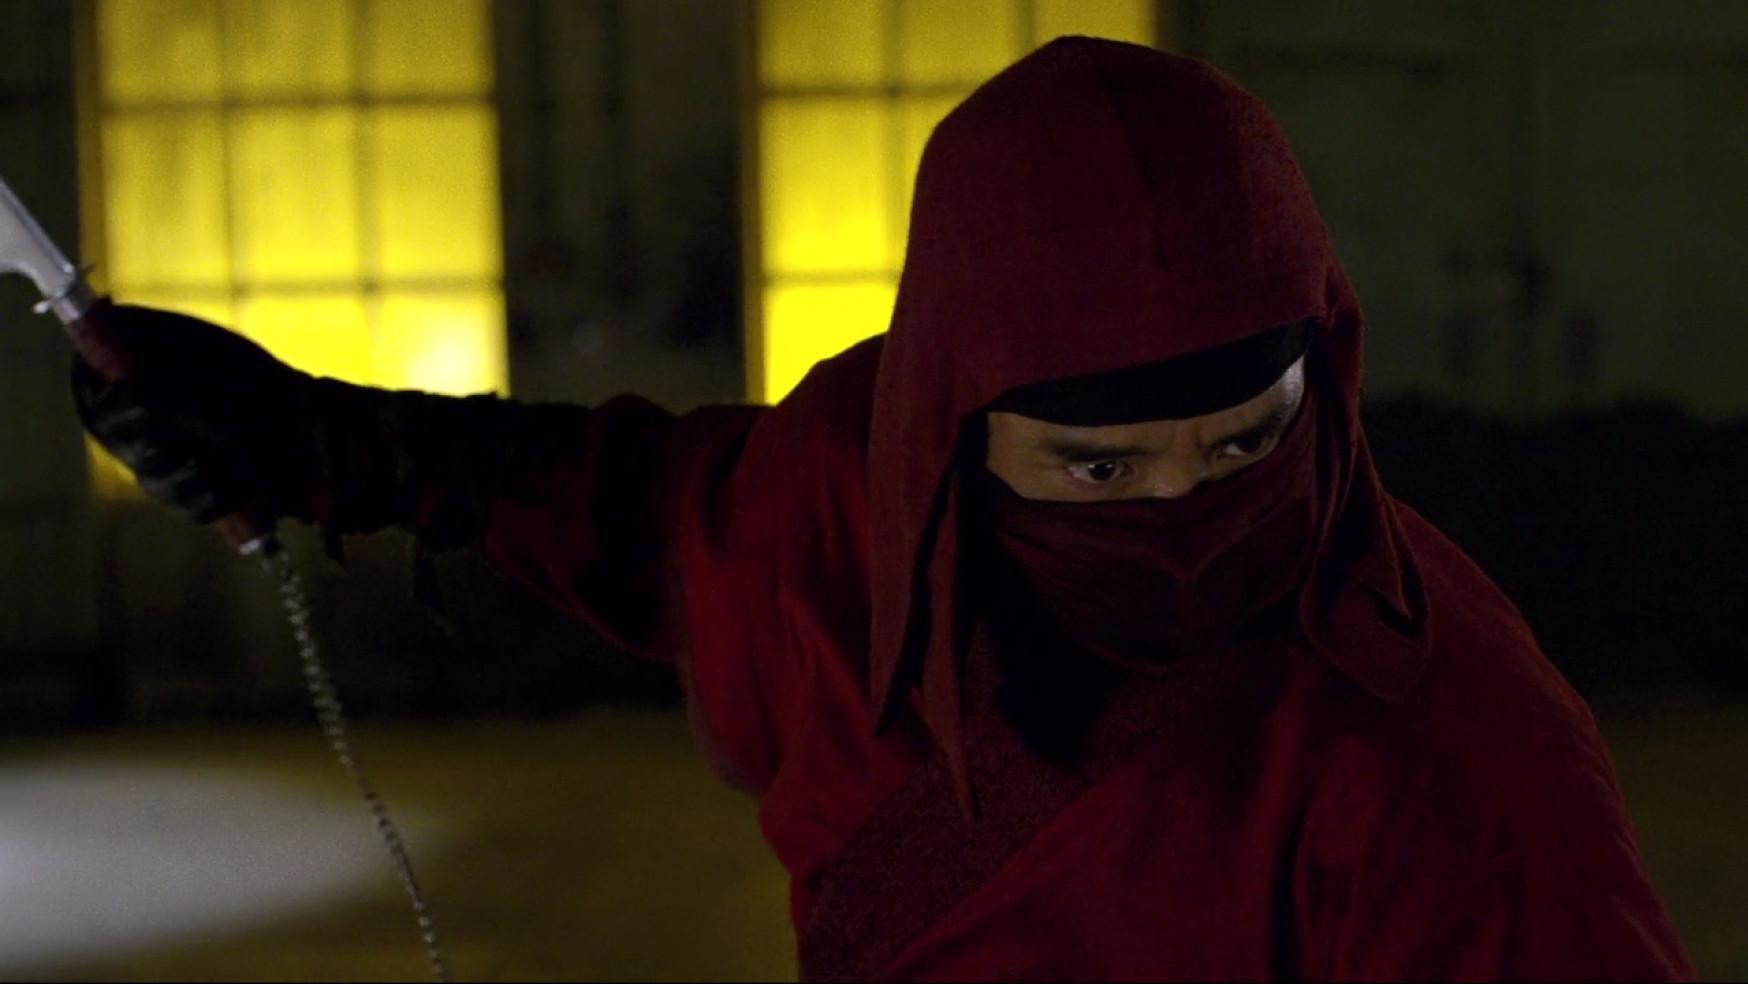 Netflix Binge: Daredevil episodes 9-12 – Not Another Dumb Blonde